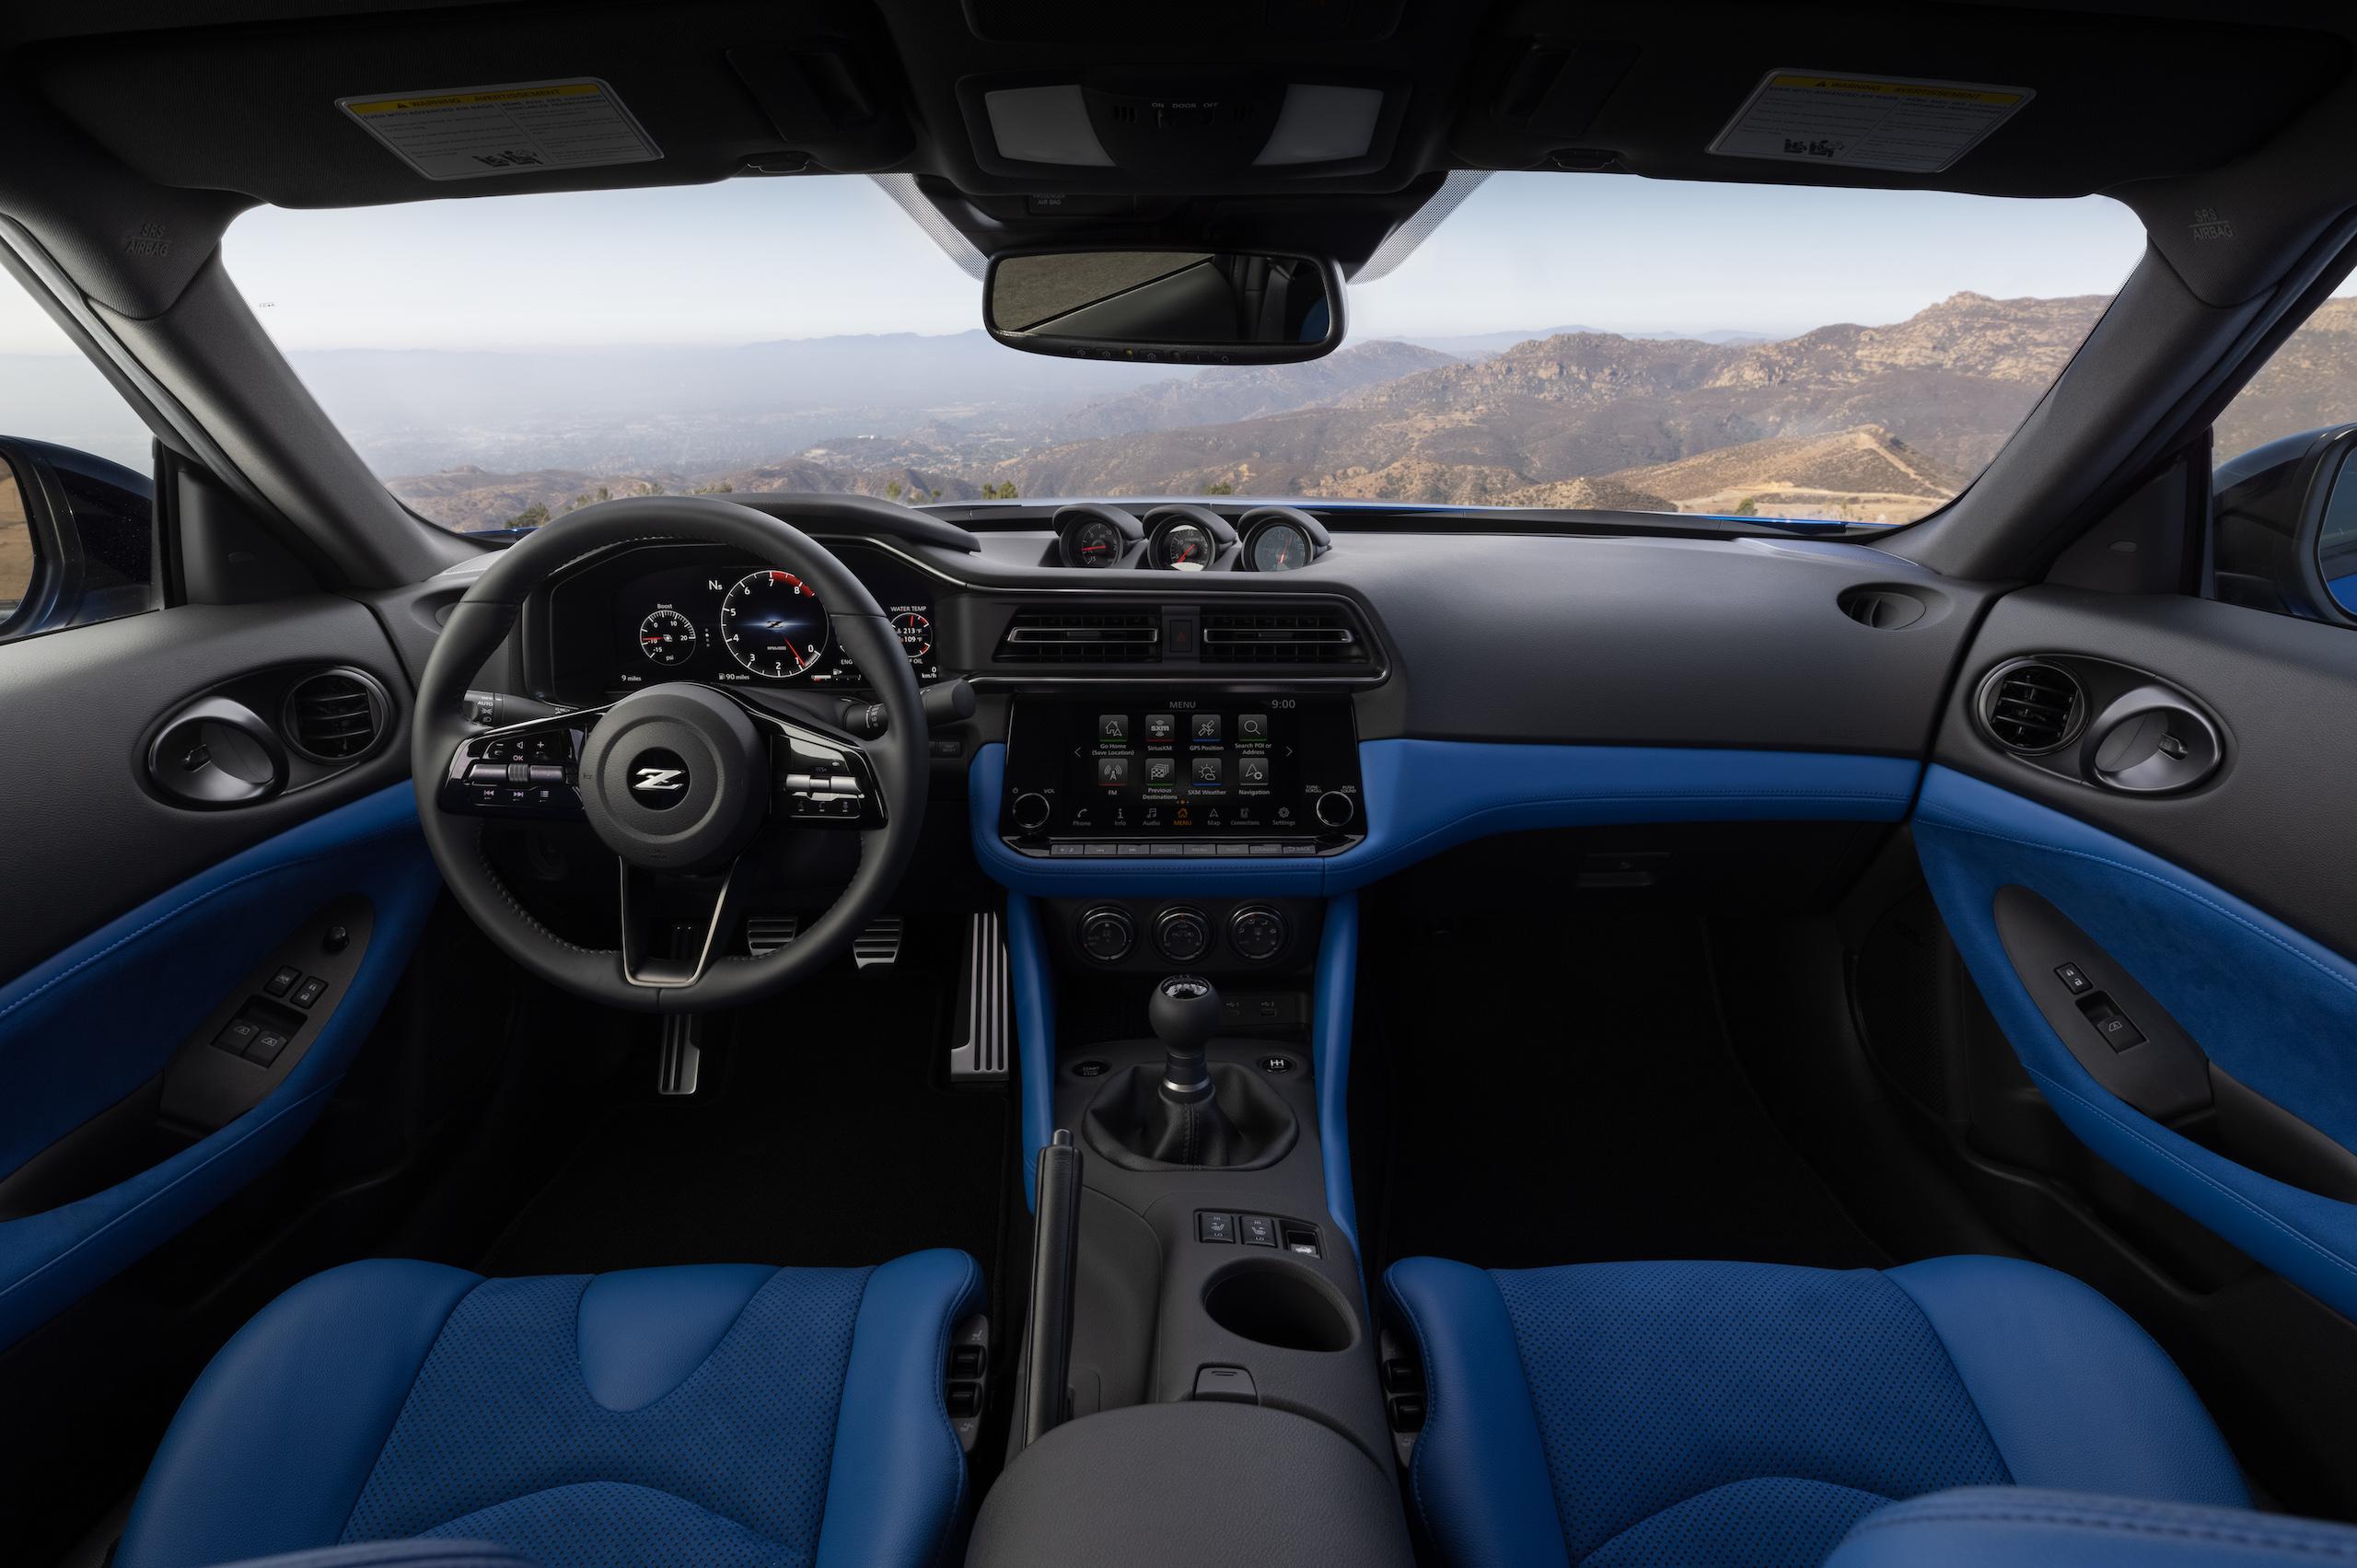 2023 Nissan Z interior front